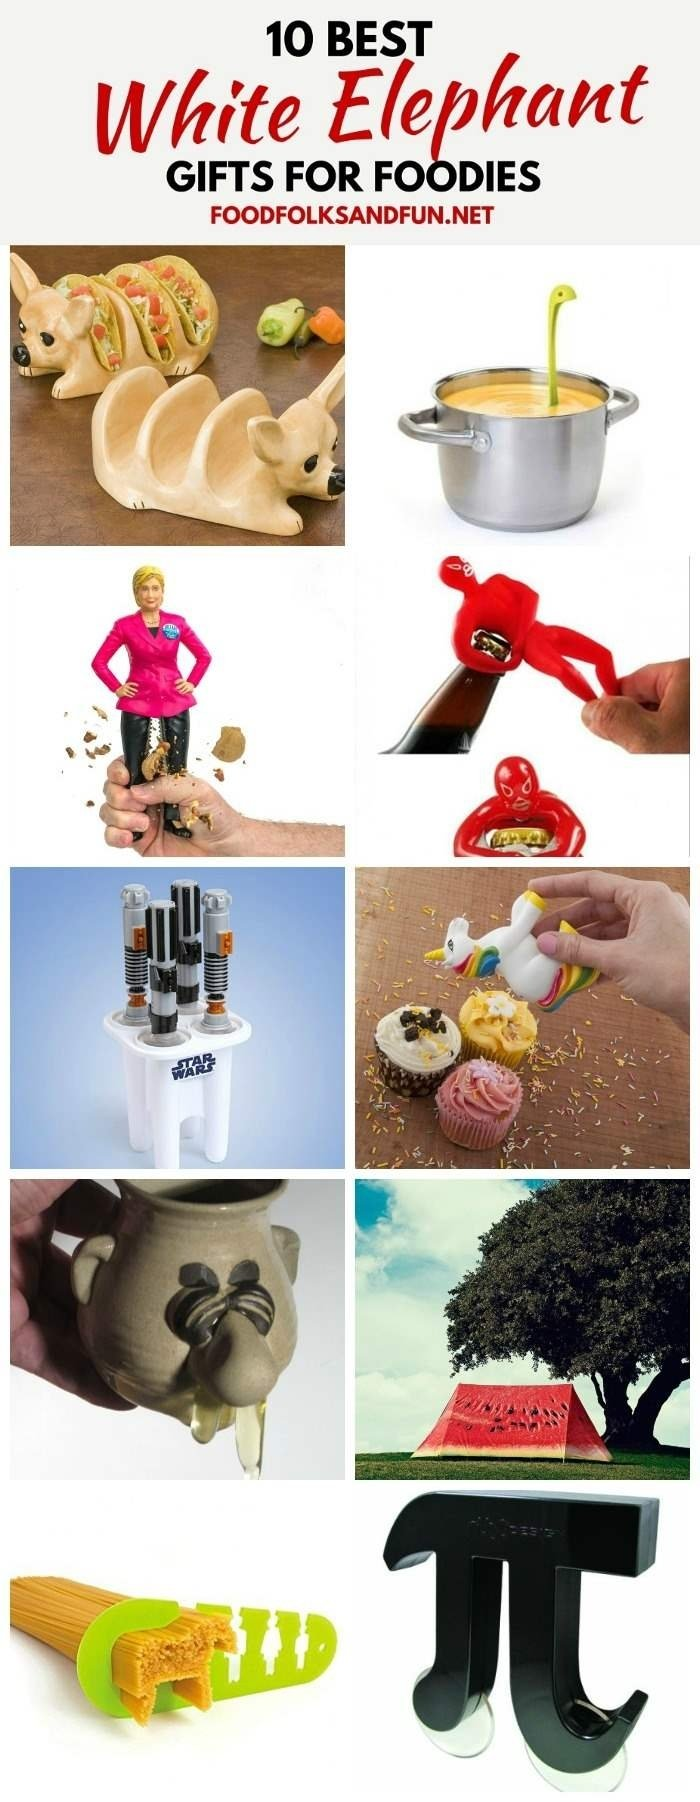 10 Attractive Top White Elephant Gift Ideas white elephant gift ideas for foodies e280a2 food folks and fun 2020